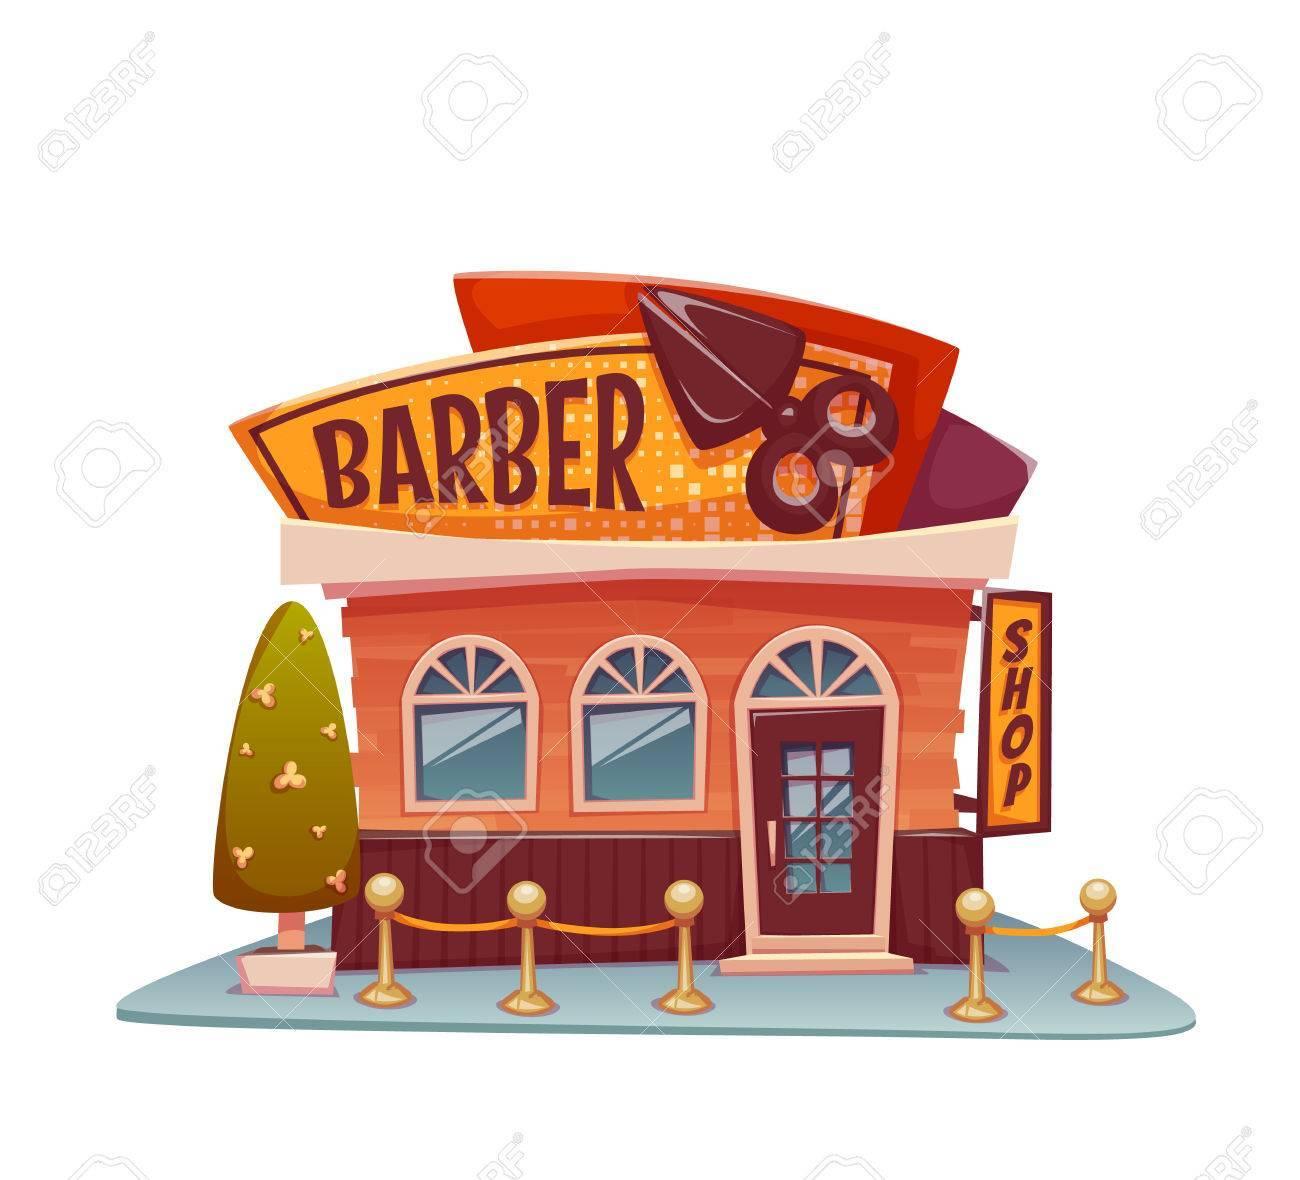 Barber shop building with bright banner. Vector illustration.